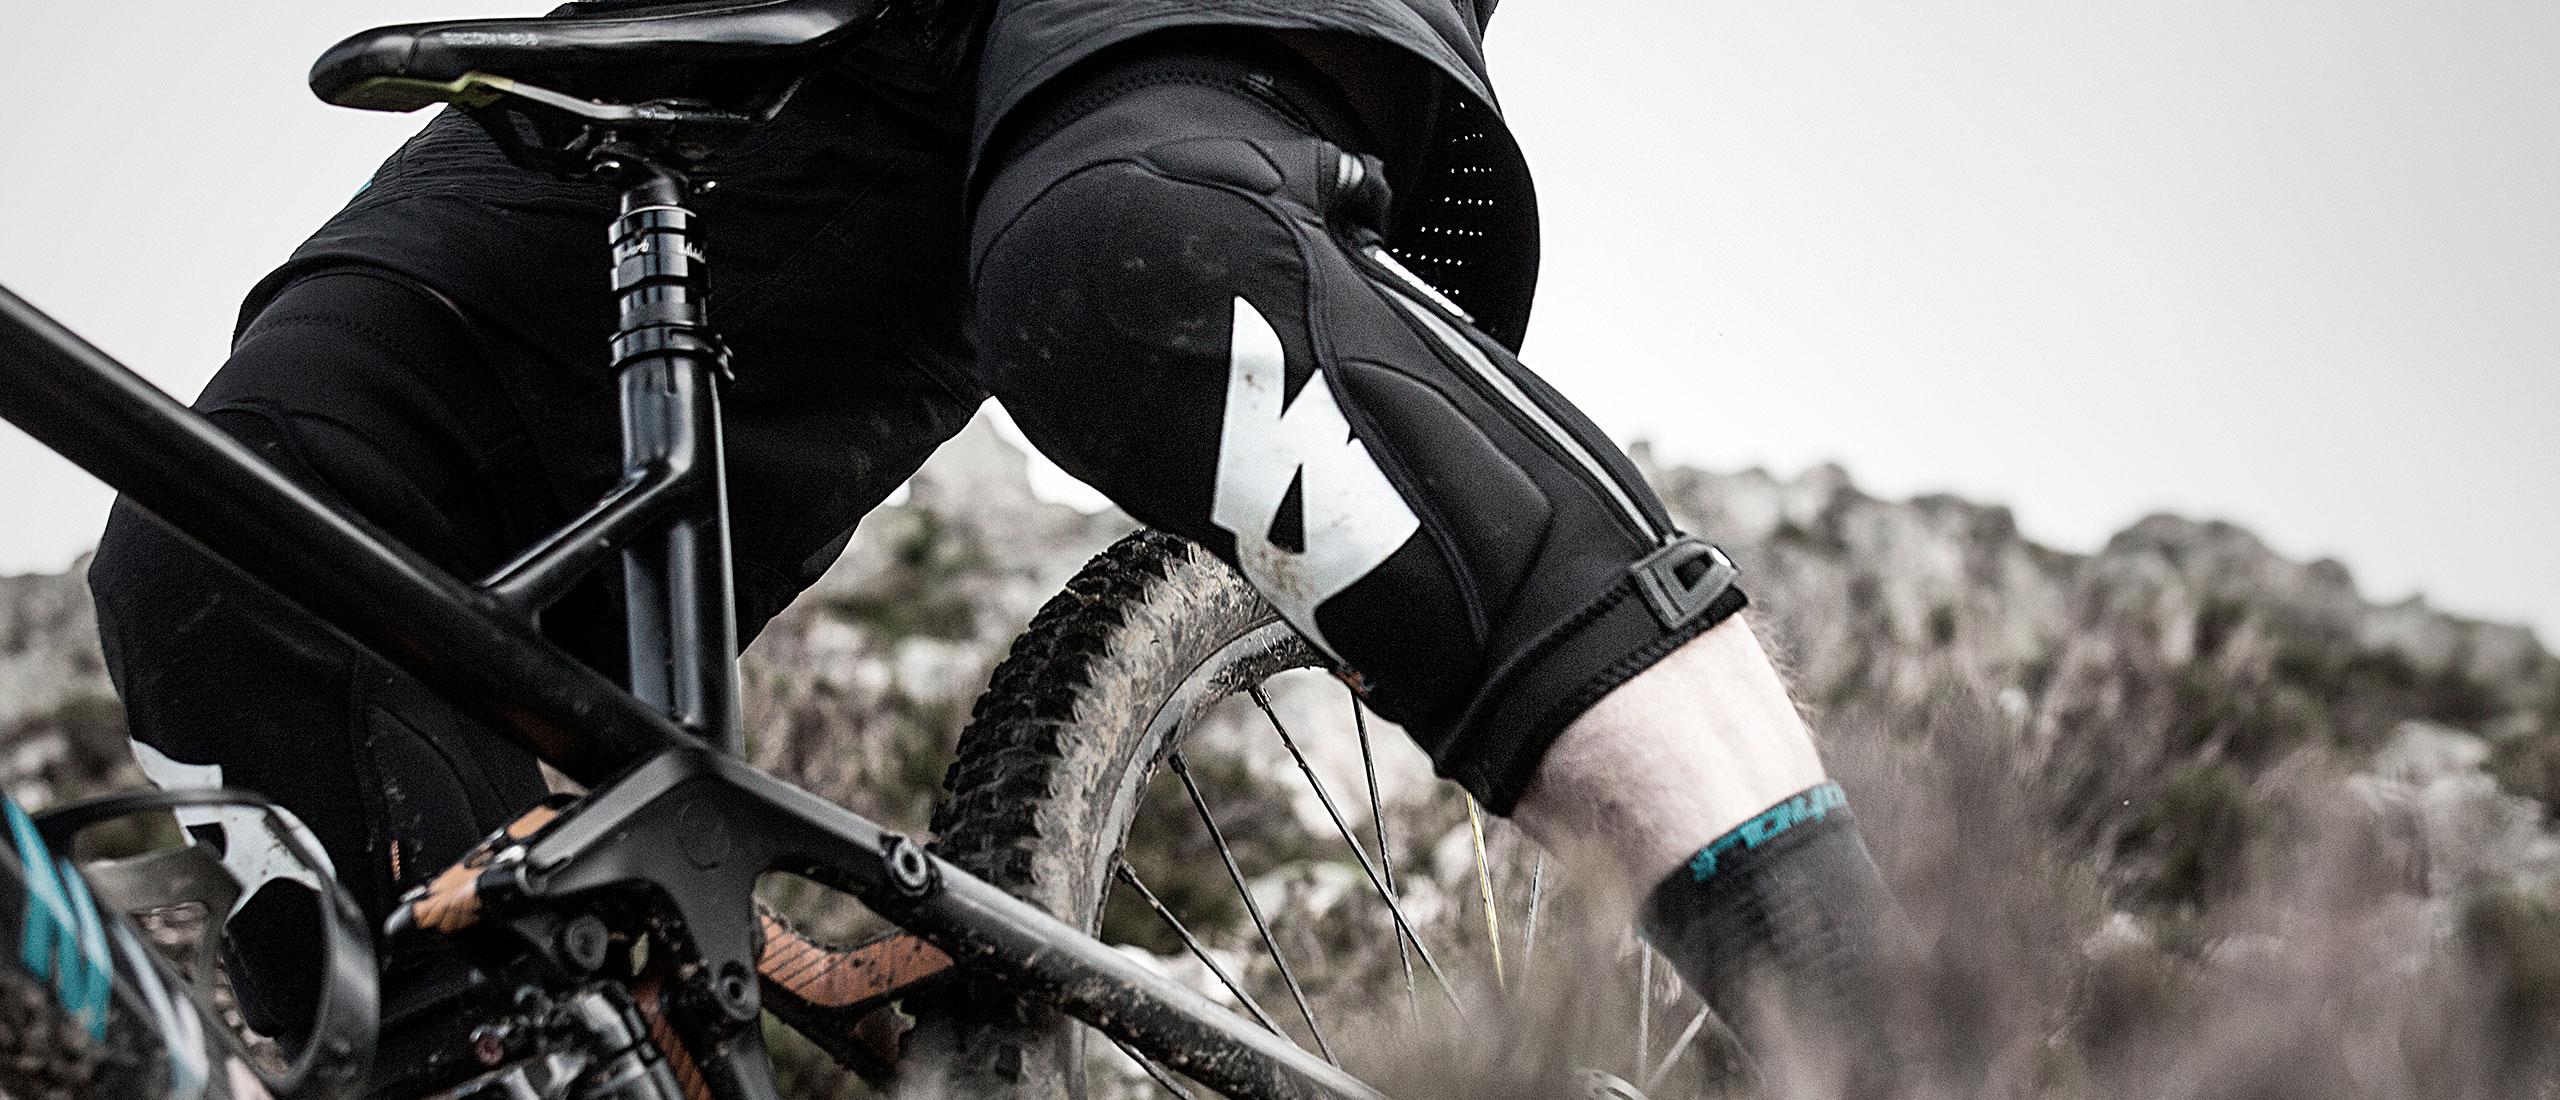 Bluegrass Solid D3O Knee Protection made for Mountain Bike, Enduro and E-Bike